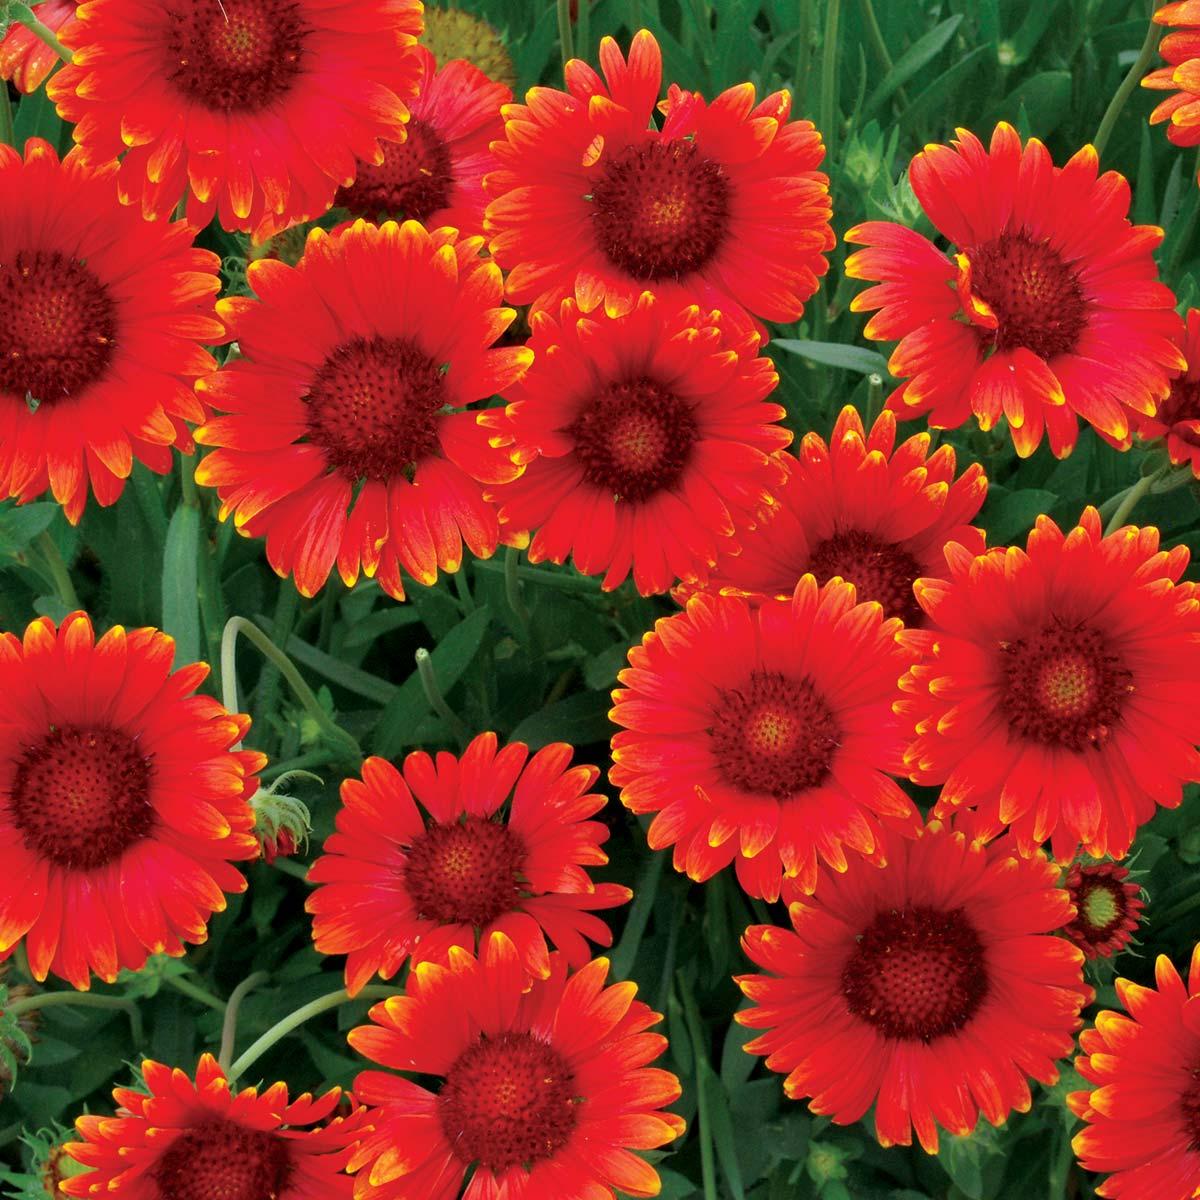 Gaillardia 'Red Sun'